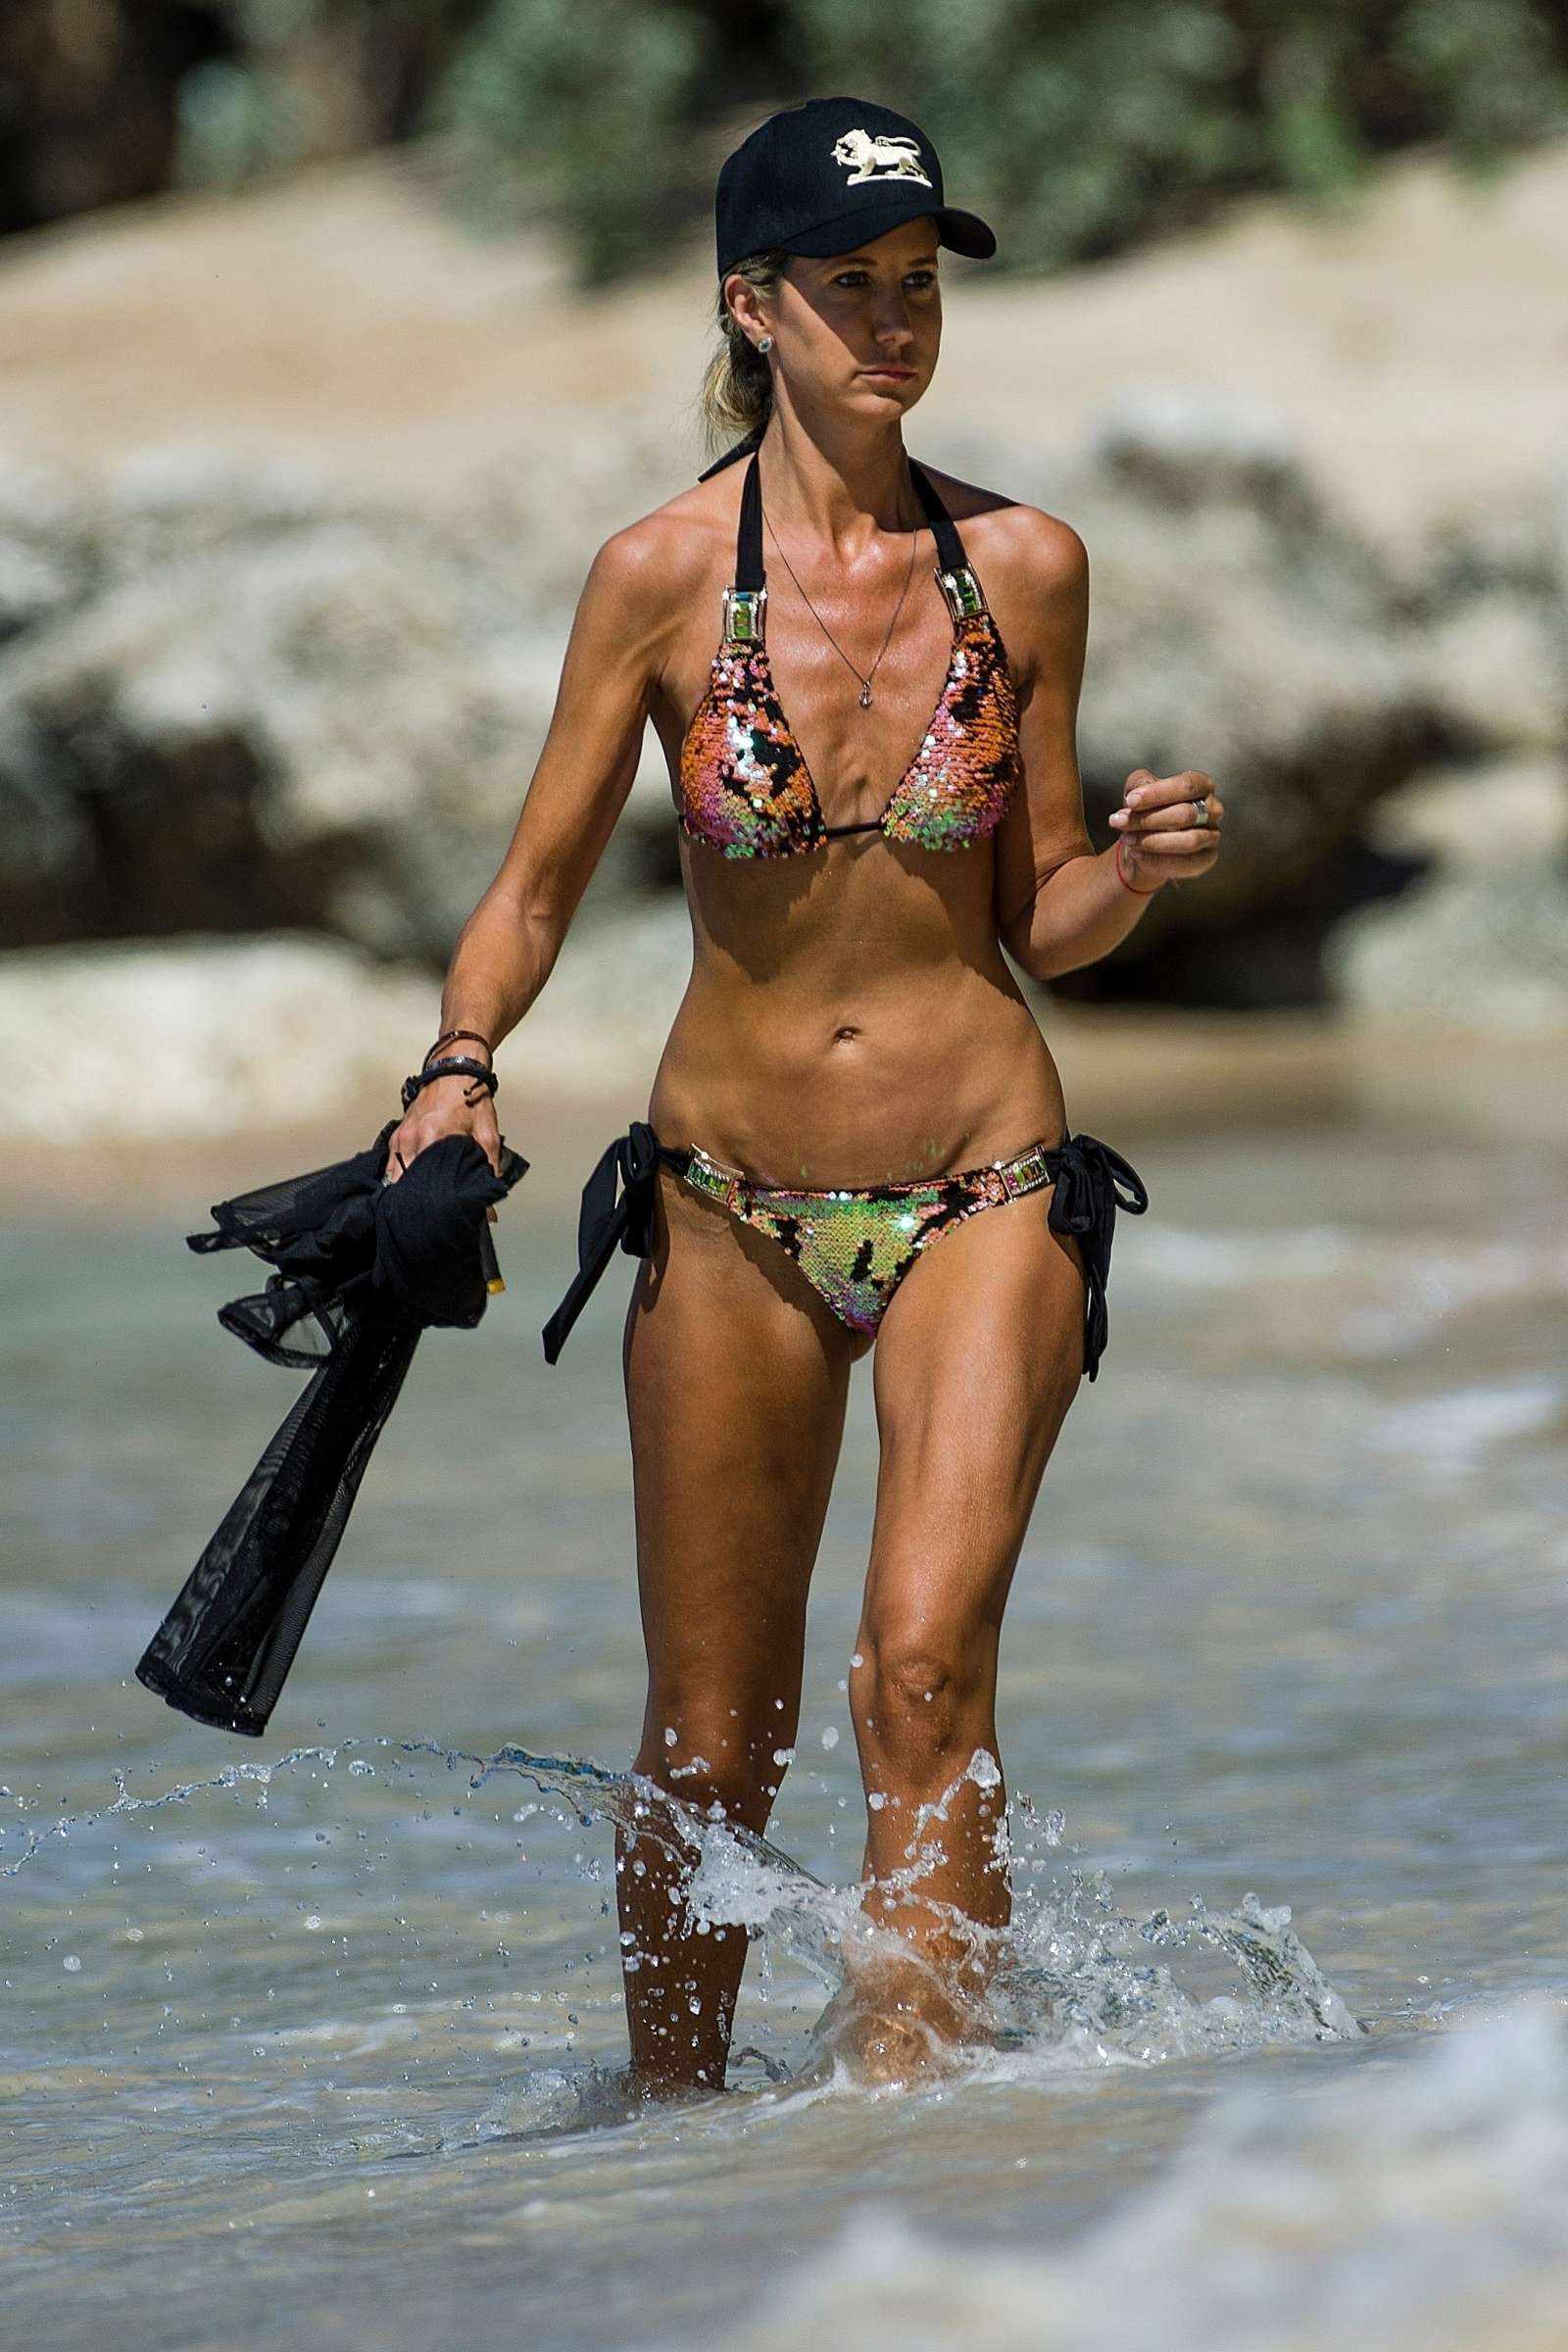 2019 Lady Victoria Hervey nudes (36 photo), Topless, Bikini, Instagram, butt 2015